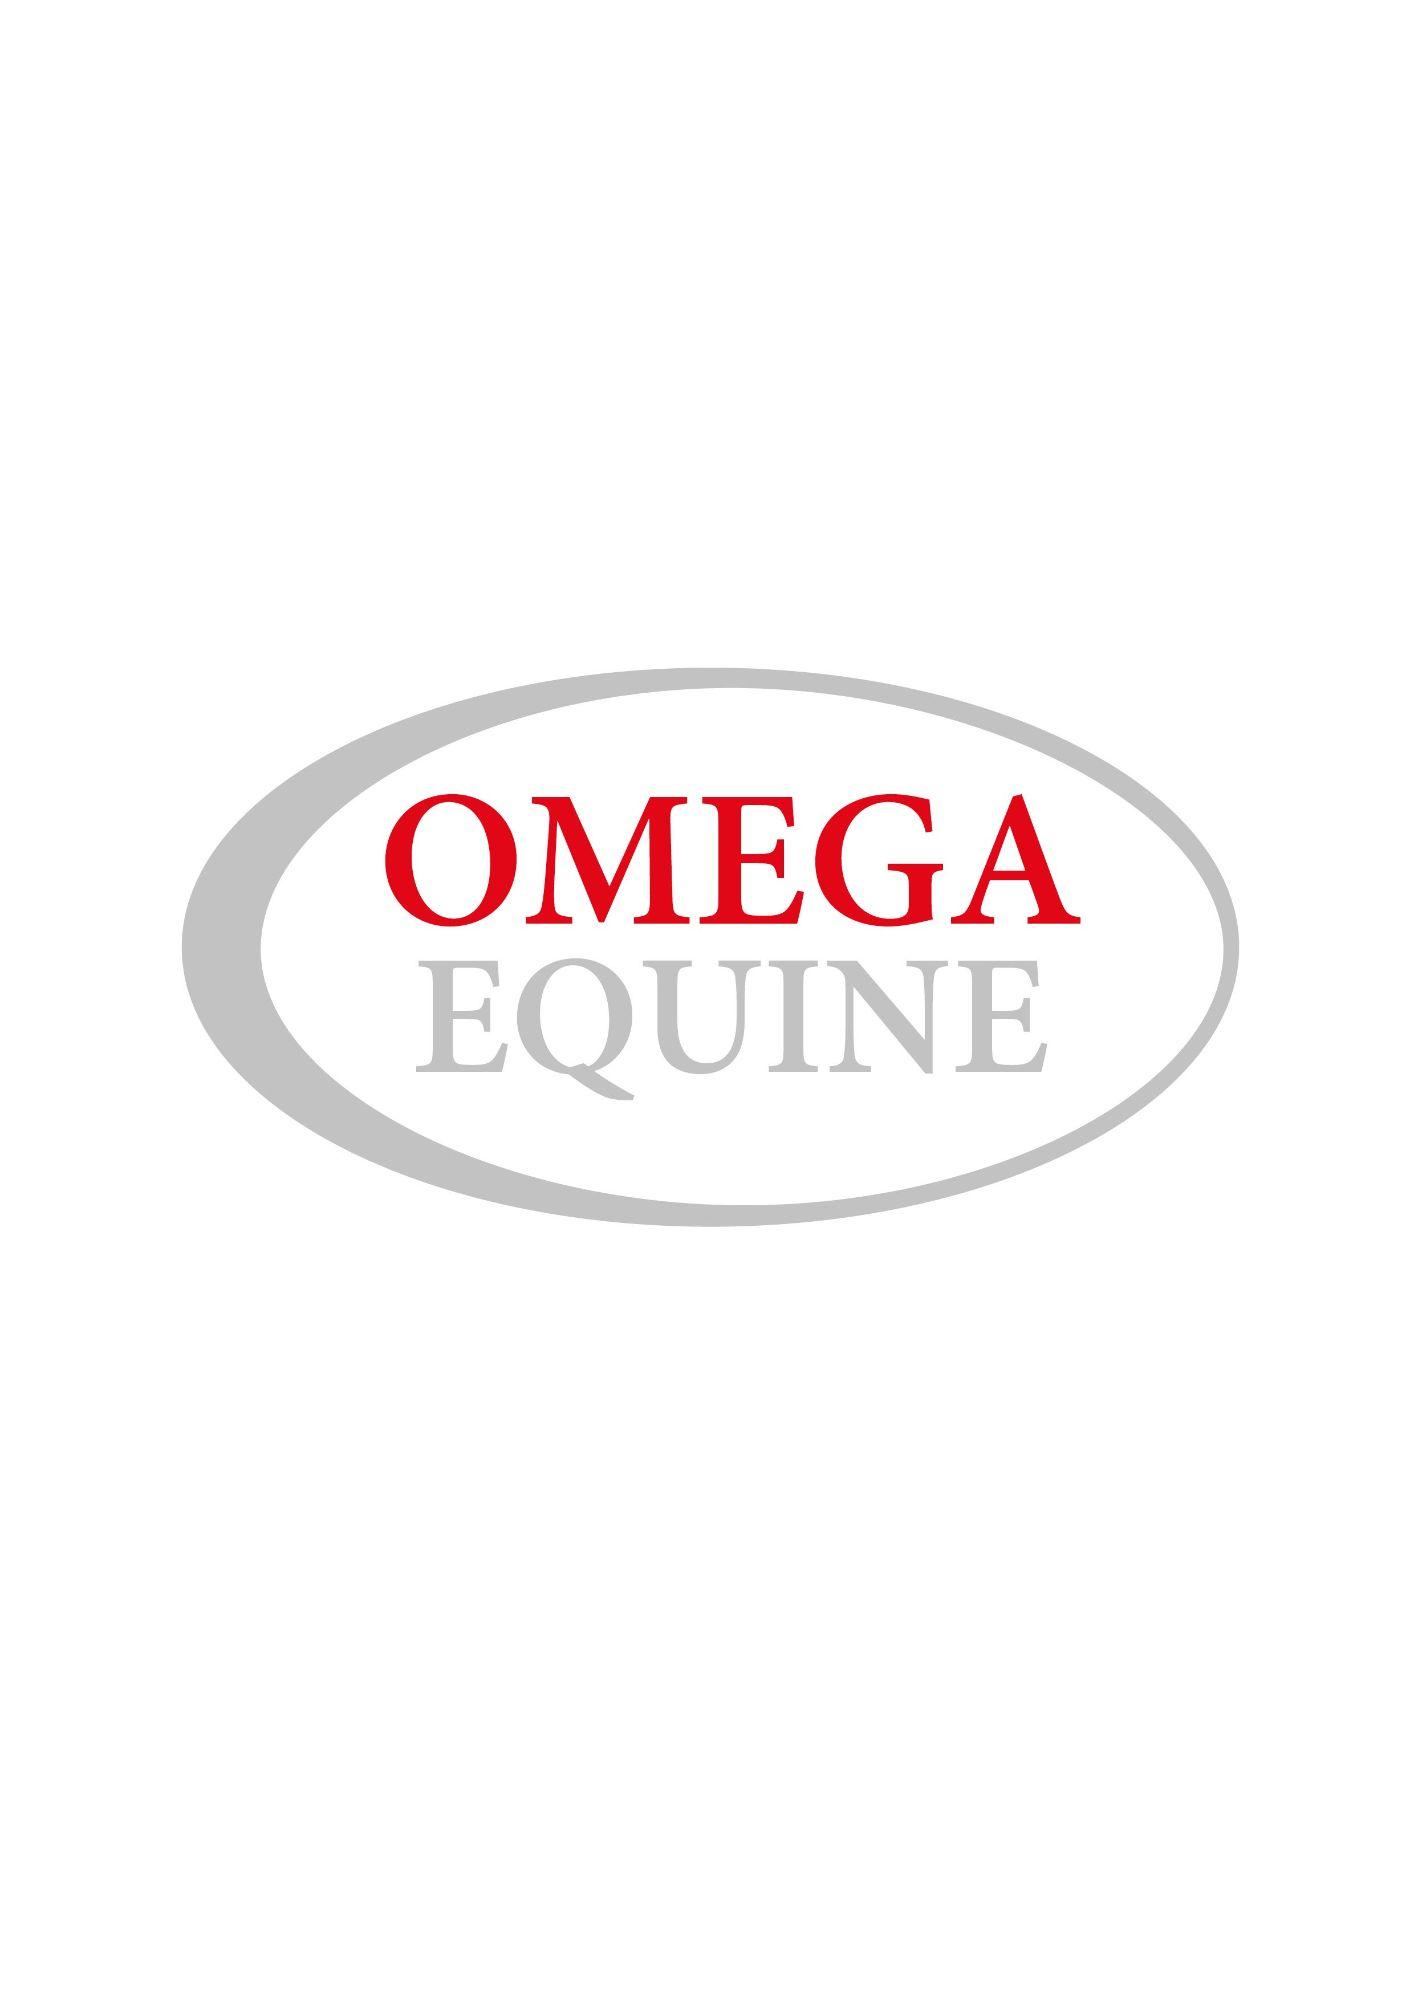 omega logo 2